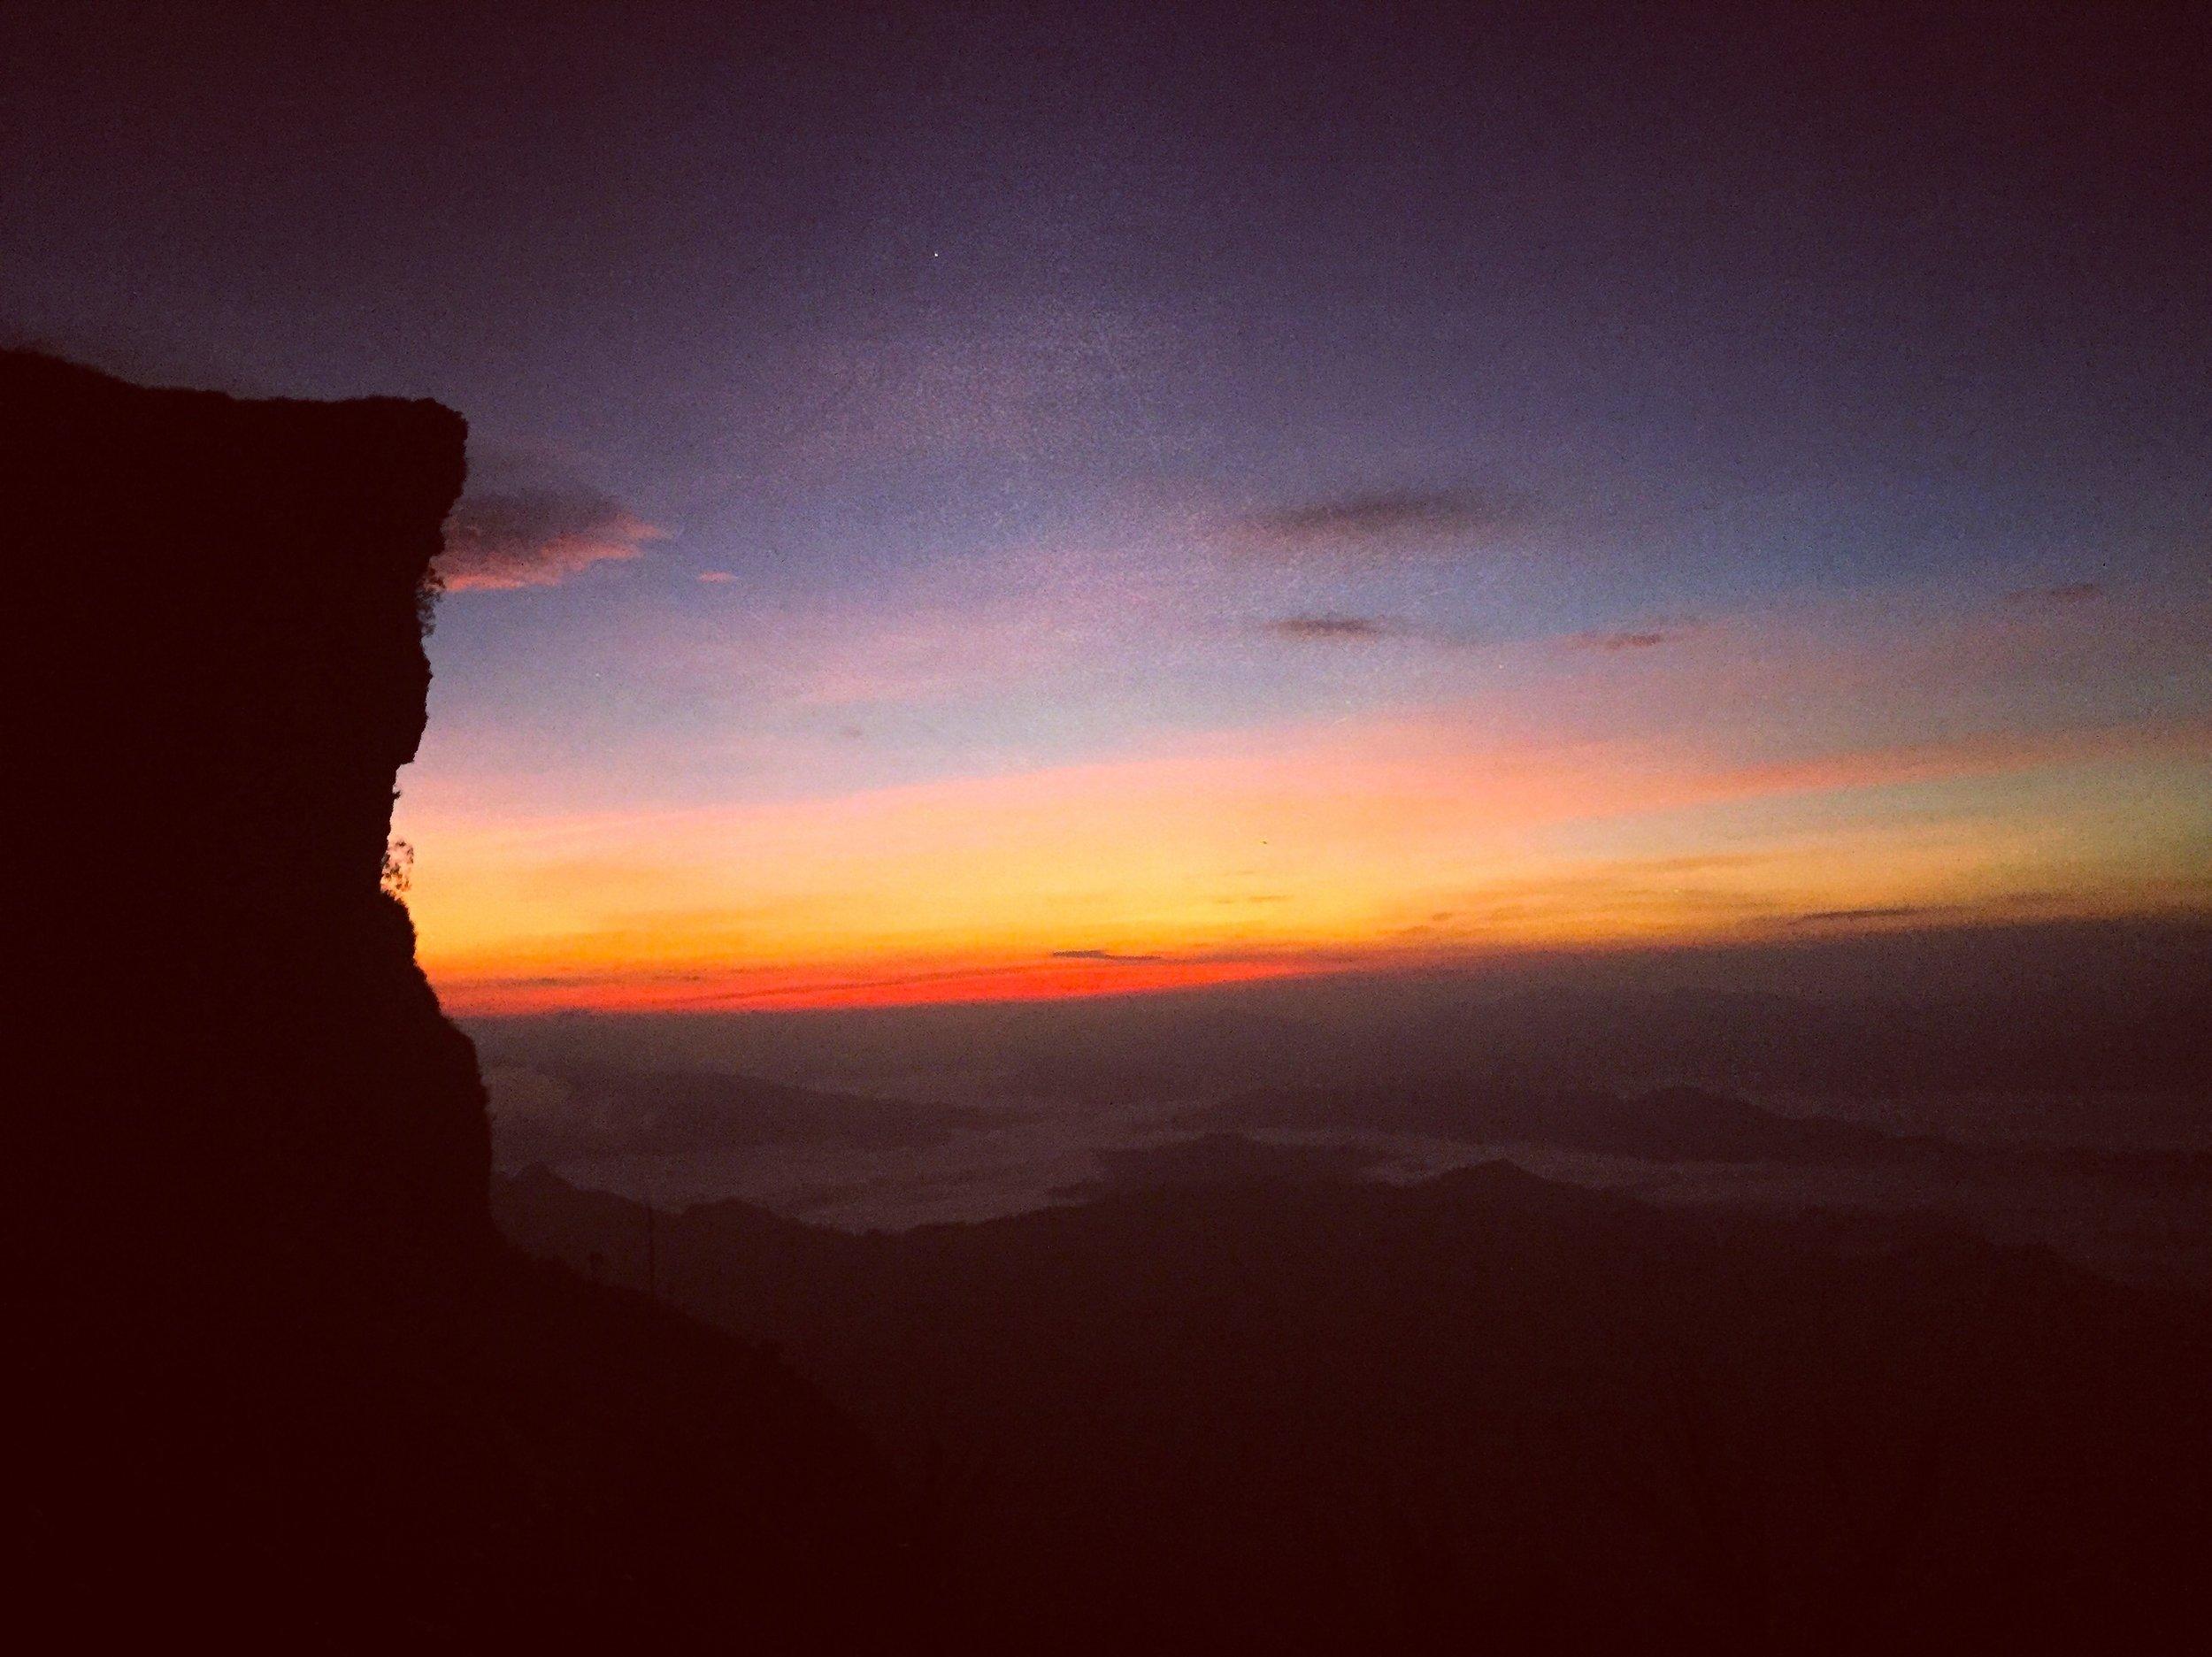 Sunrise at Phu Chi Fah